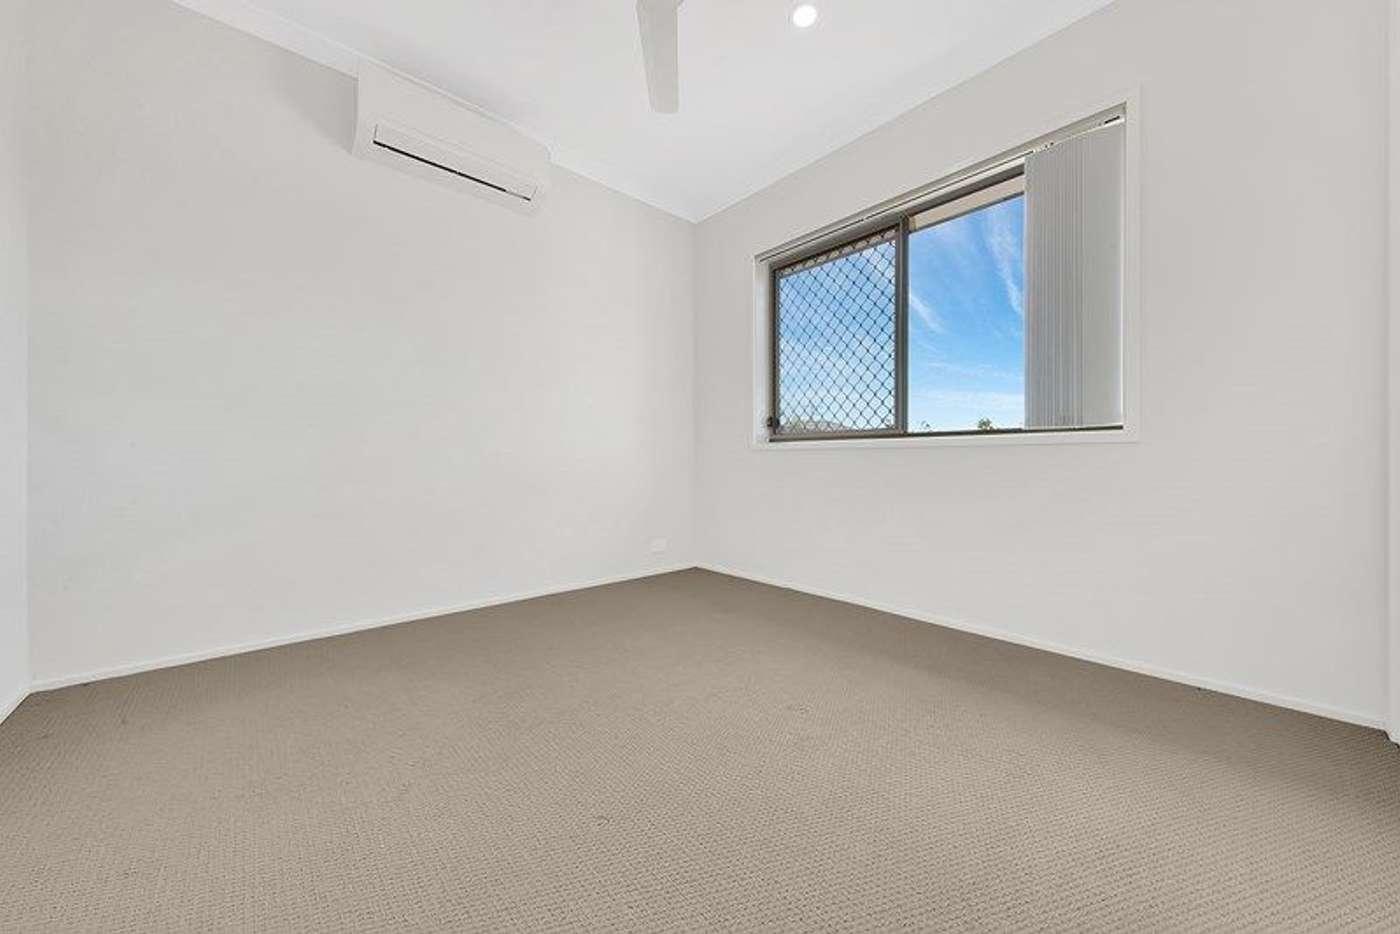 Seventh view of Homely house listing, 4 Josephine Street, Boyne Island QLD 4680